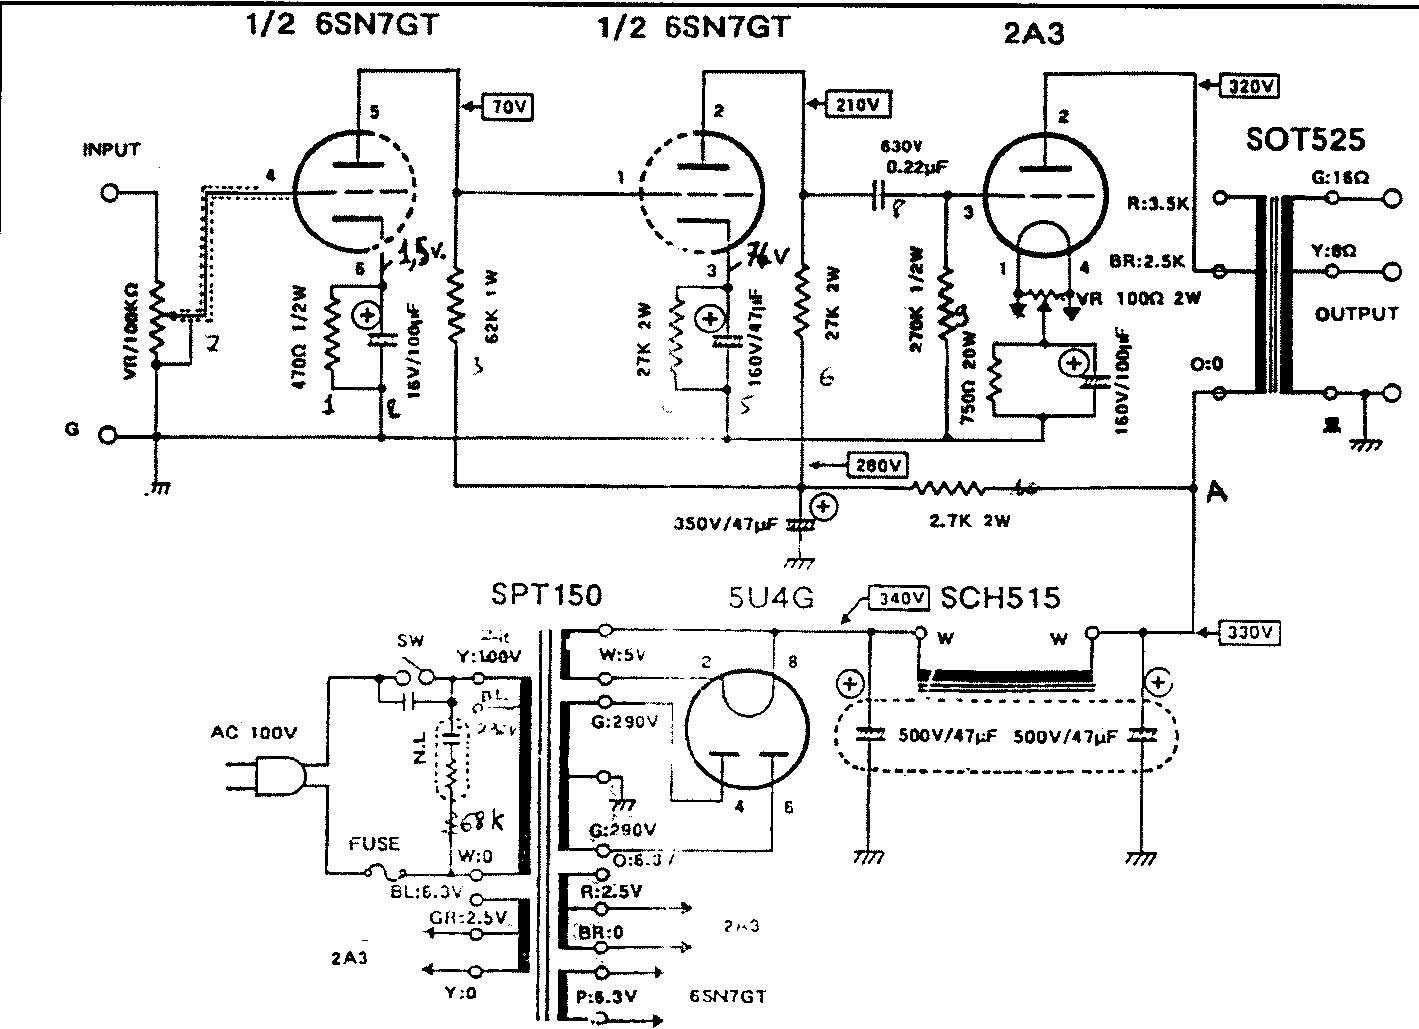 circuits gt preamp l31813 nextgr coro cfdiyaudio 2a3 driver for circuits gt preamp l31813 nextgr